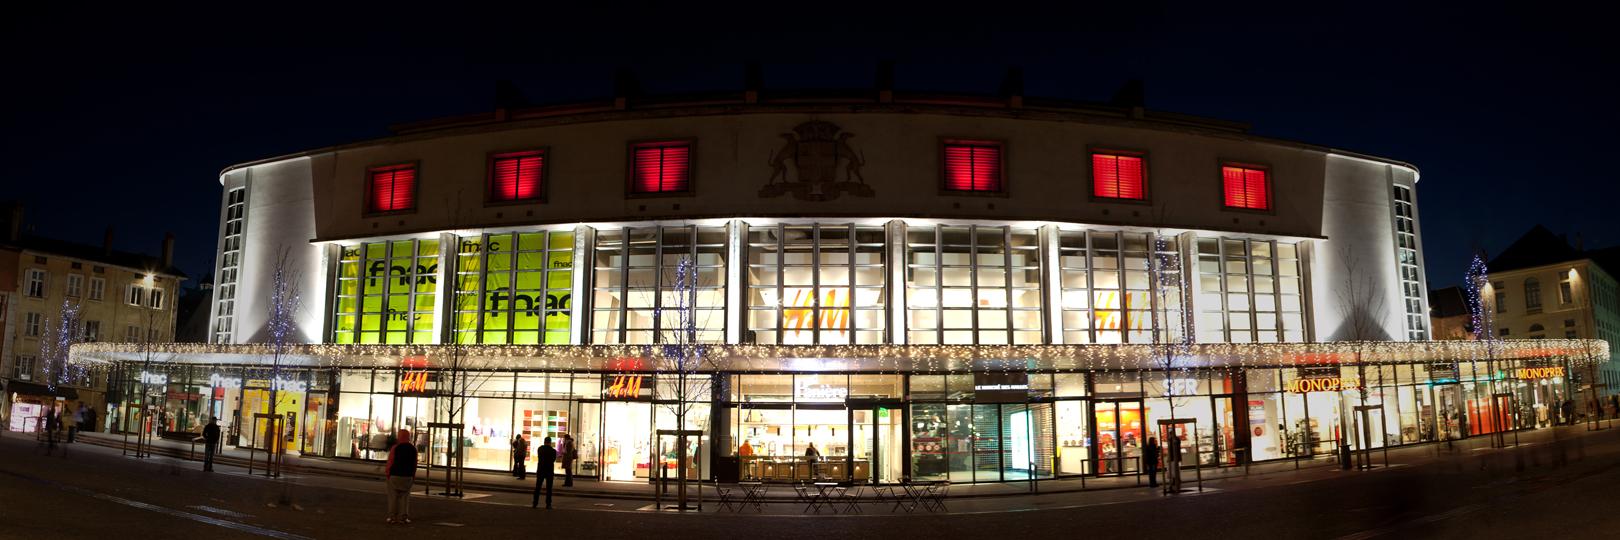 20 Les Halles de Chambéry